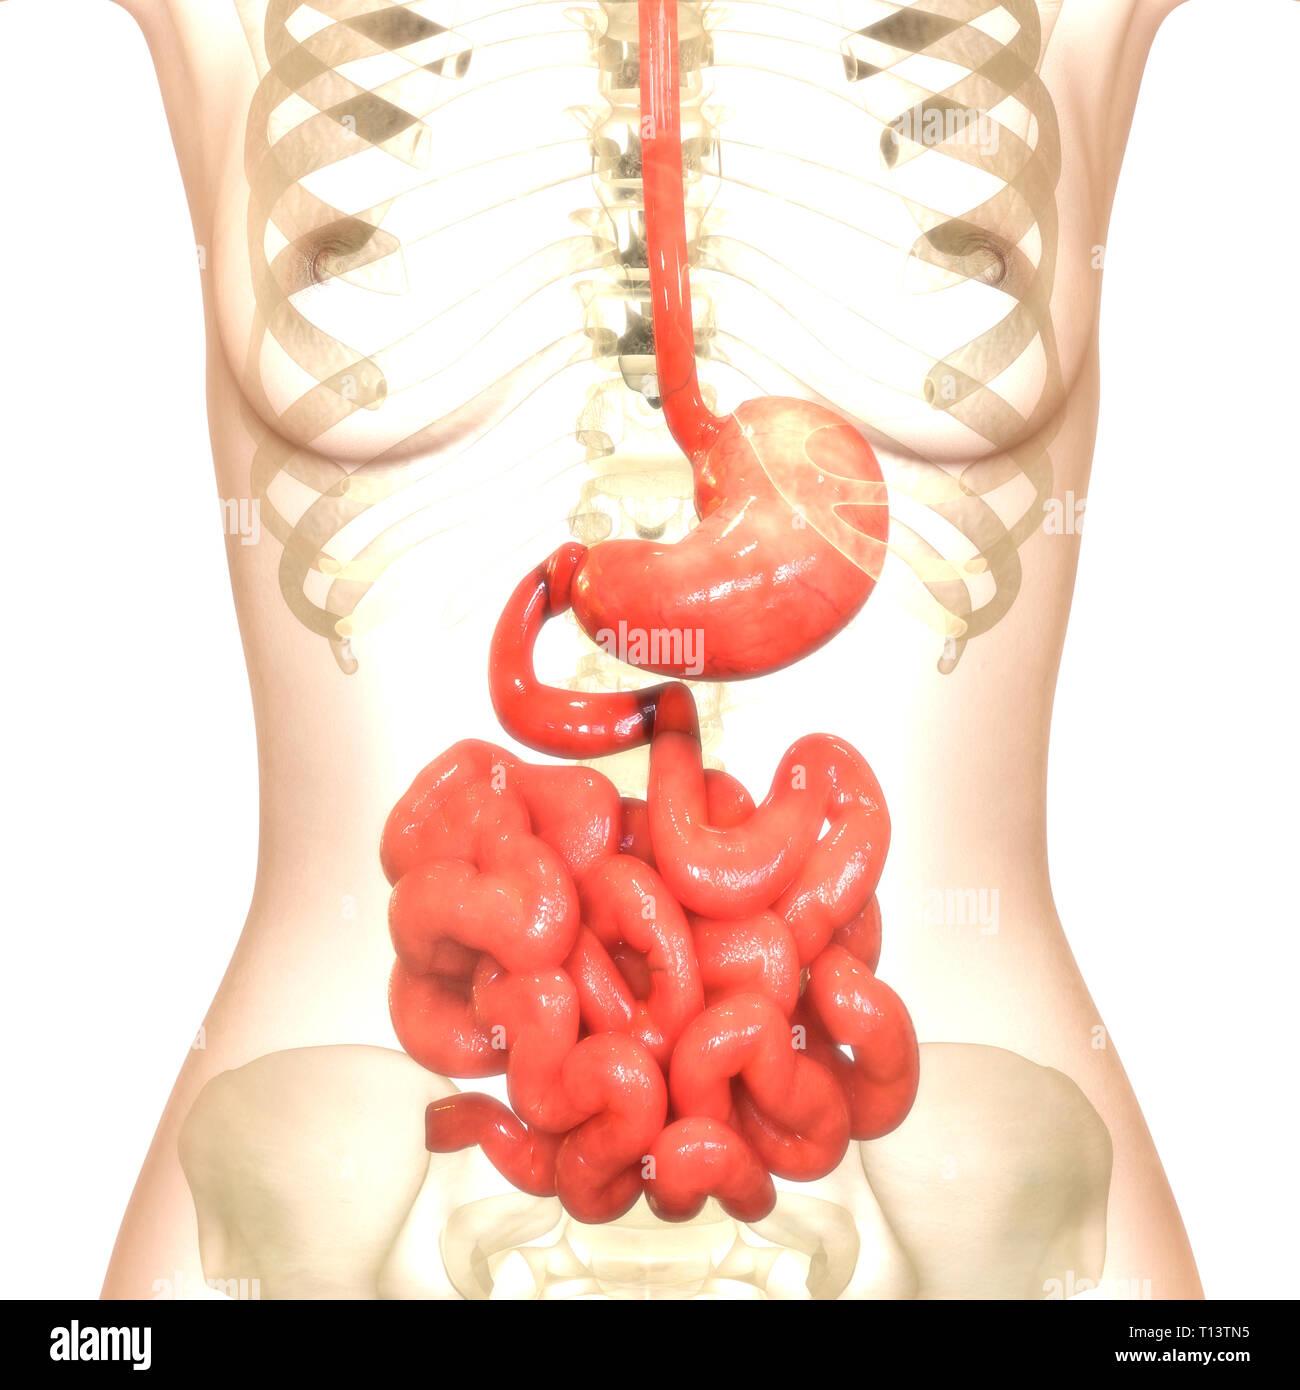 Human Digestive System Stomach with Small Intestine Anatomy Stock